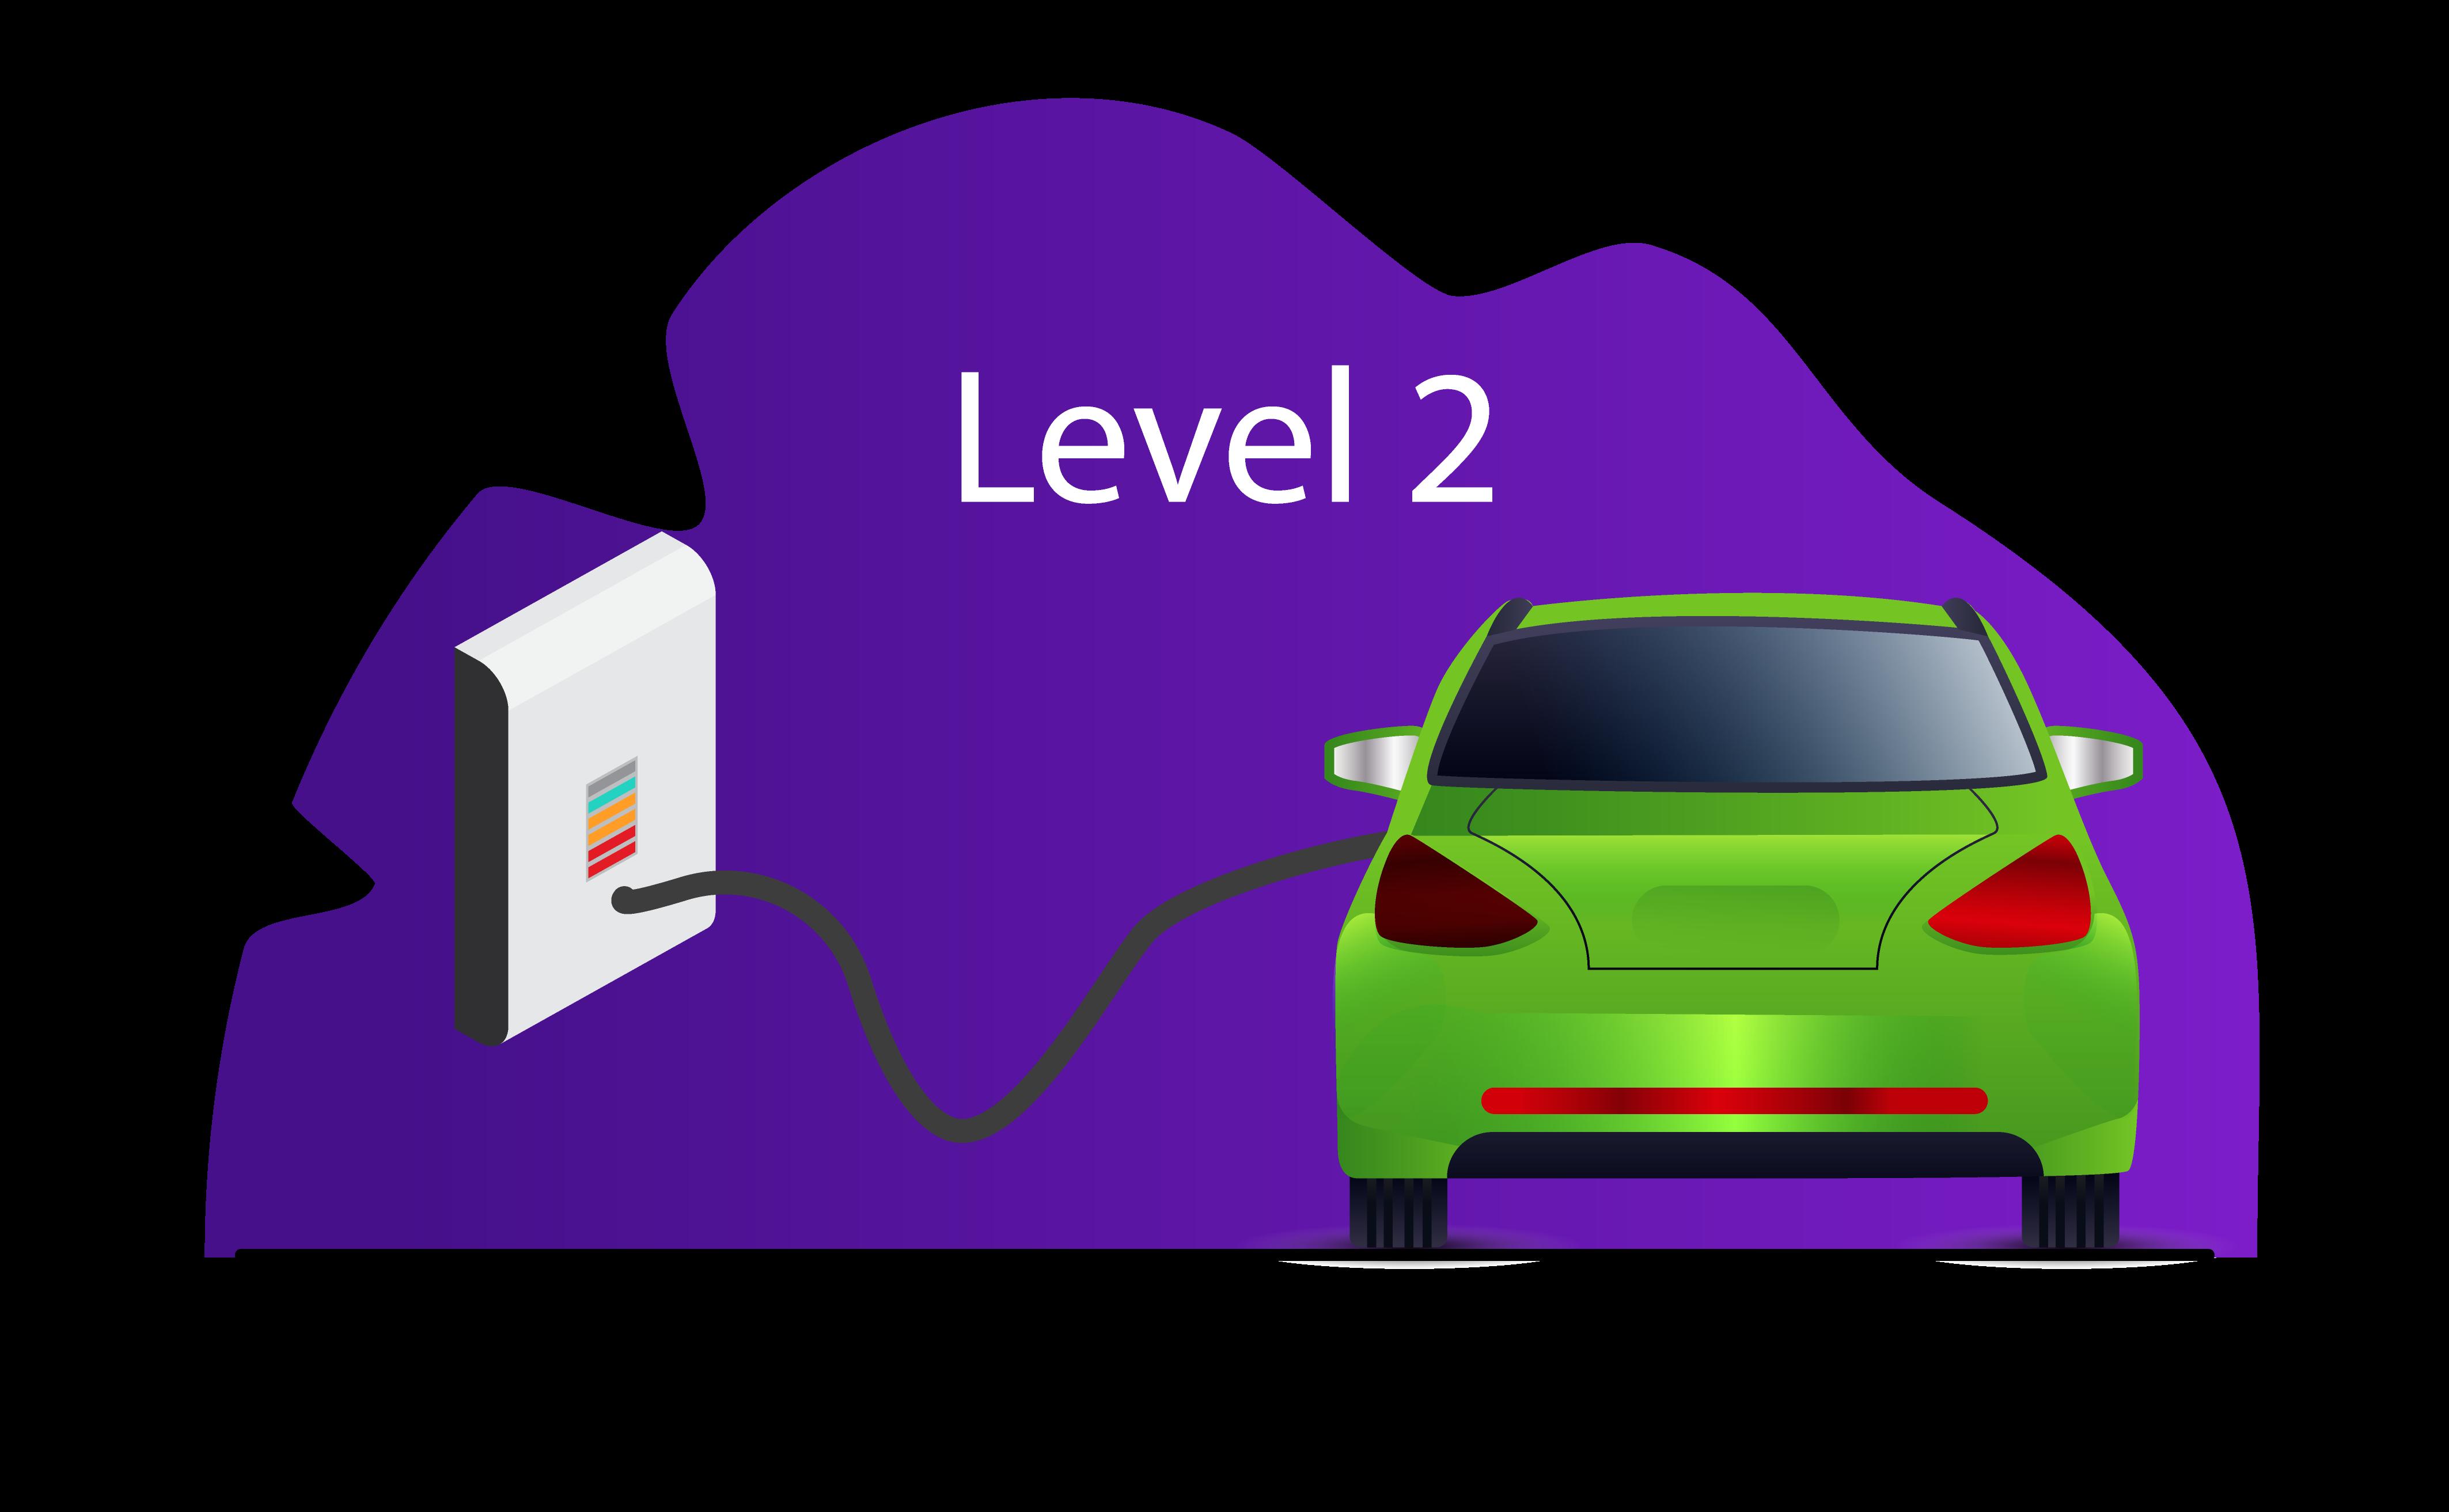 Level 2 charging EV